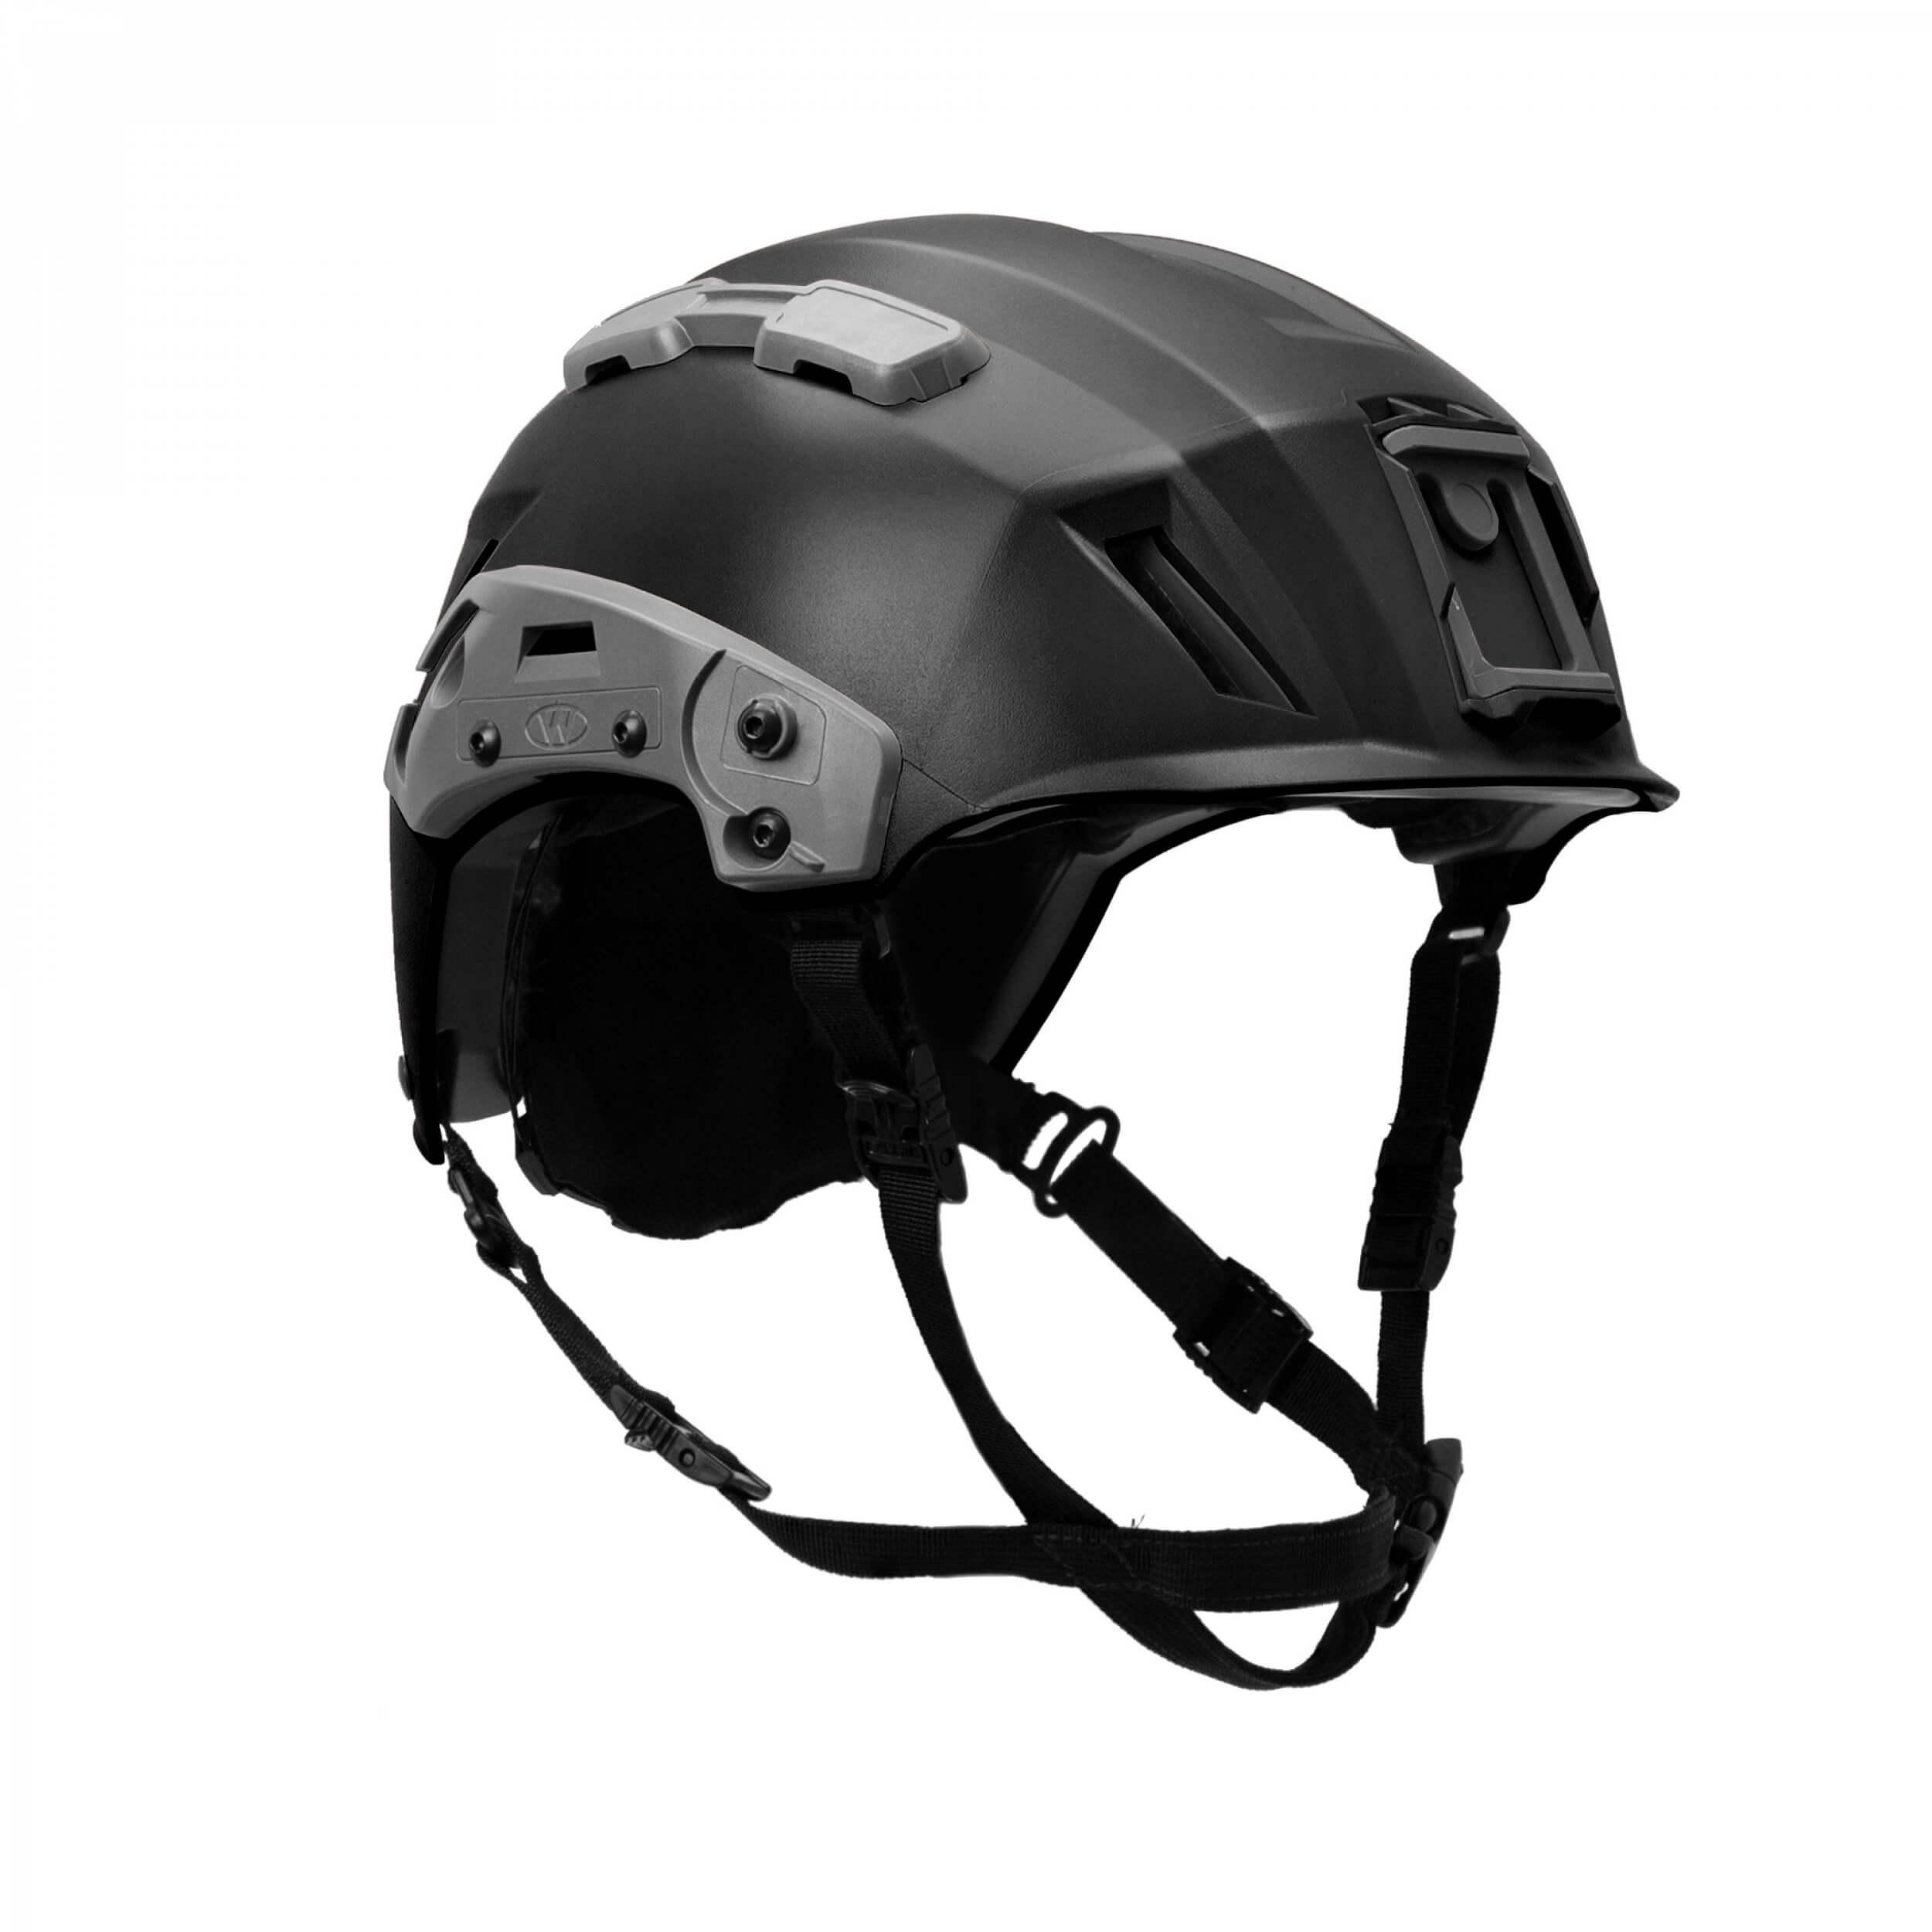 Team Wendy EXFIL SAR Tactical Helmet black